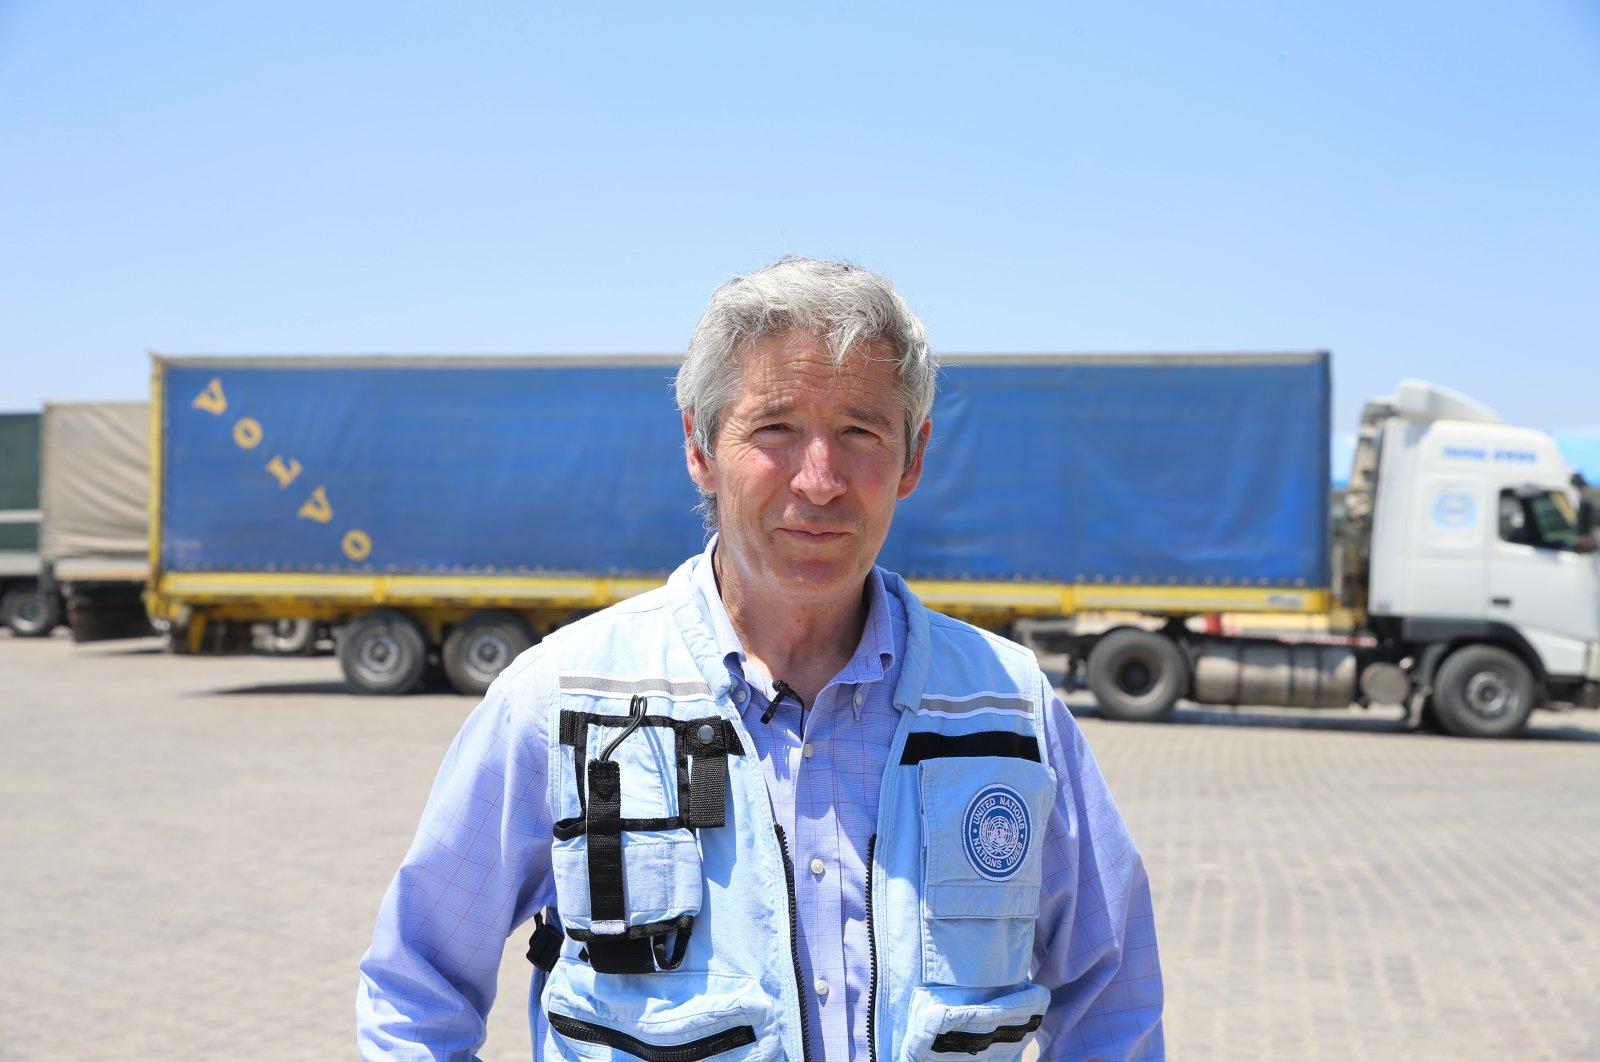 U.N. Deputy Regional Humanitarian Coordinator for the Syria Crisis Mark Cutts visits the Cilvegözü border gate in Hatay province, Turkey, July 12, 2021. (AA Photo)